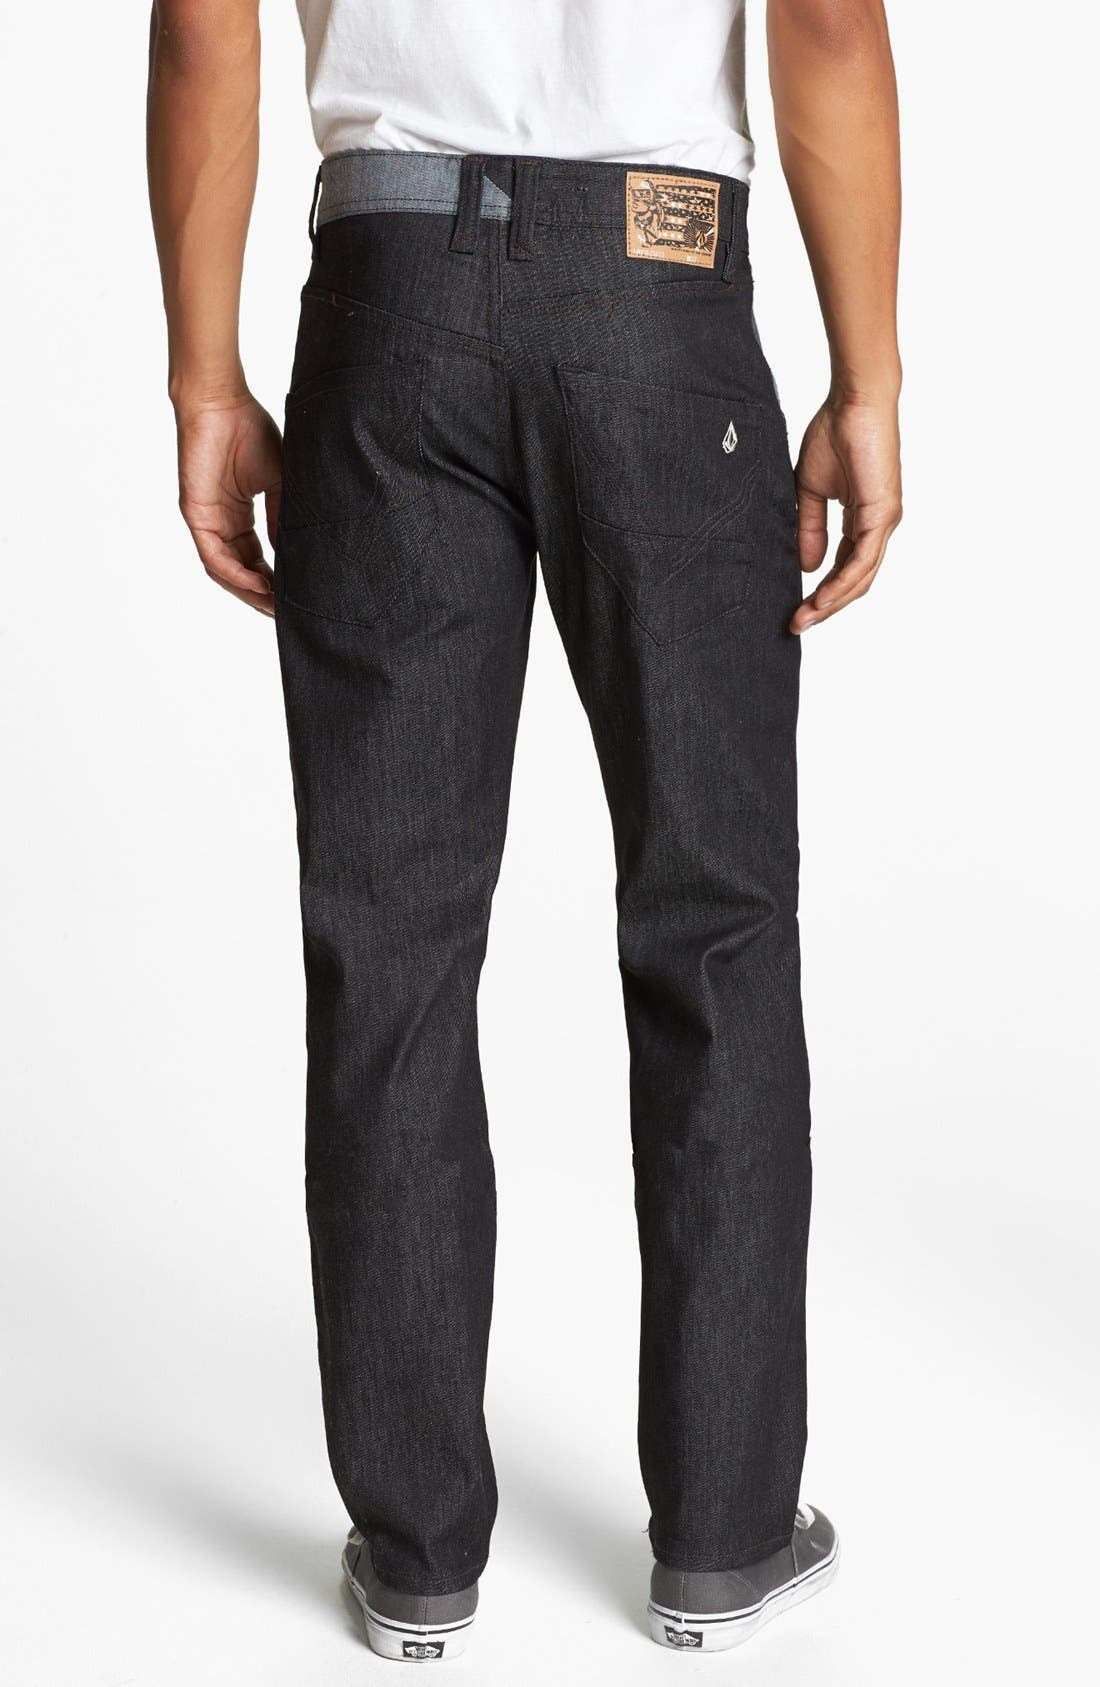 Alternate Image 1 Selected - Volcom 'Nova' Straight Leg Jeans (Dark Black Rinse)